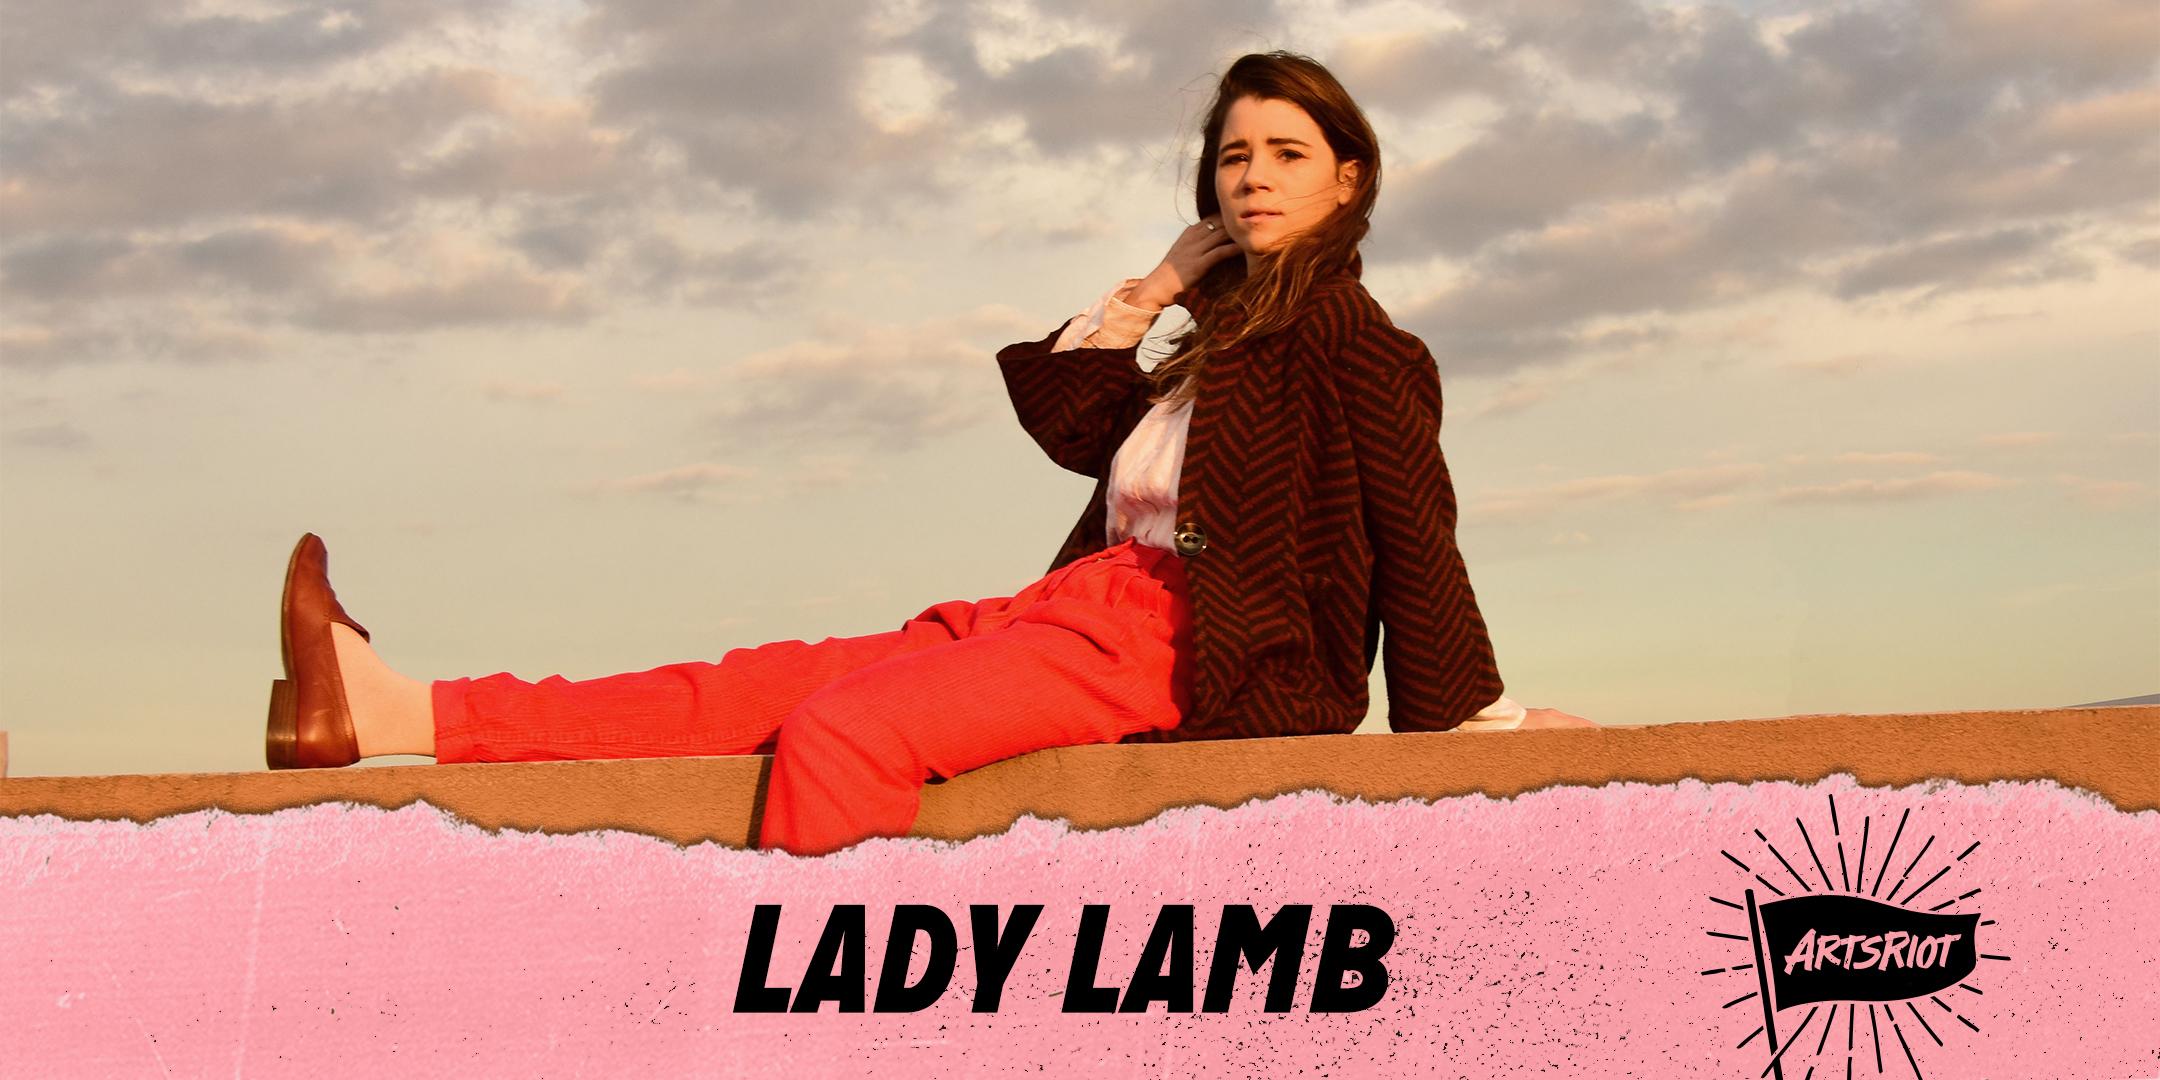 LadyLambNewBanner.jpg